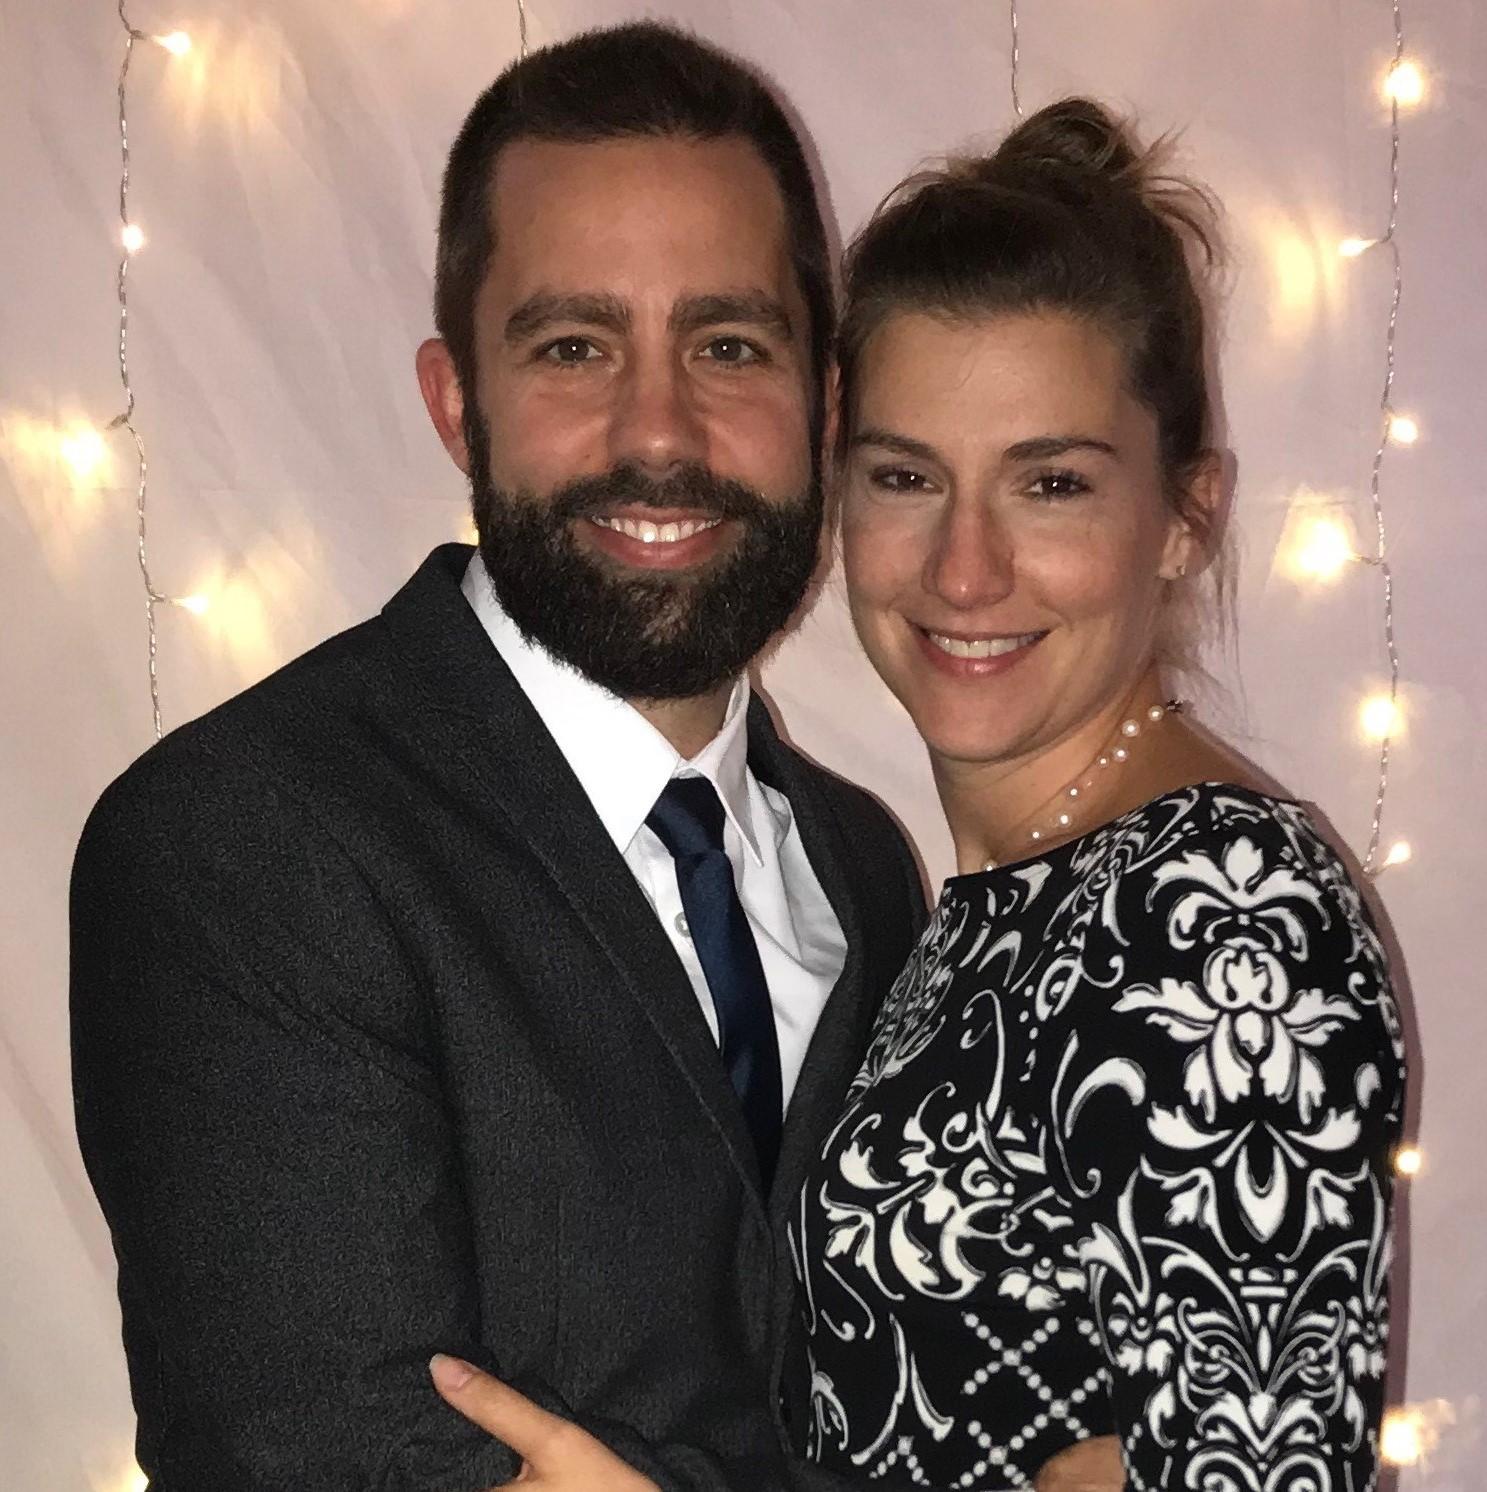 Pastors Jason + Liz Ackerman